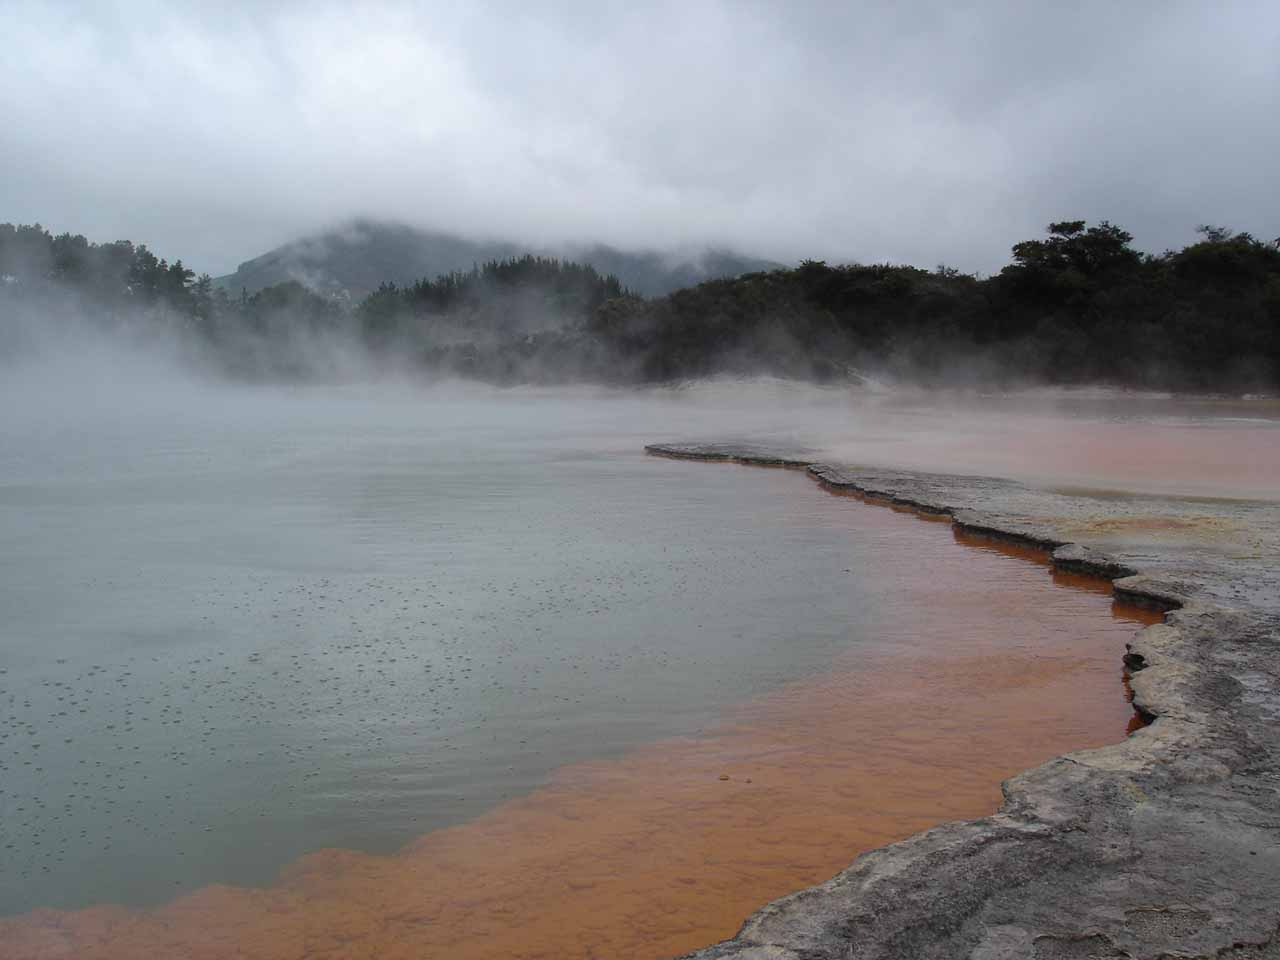 The colorful Champagne Pool in Wai-o-tapu even in the rain